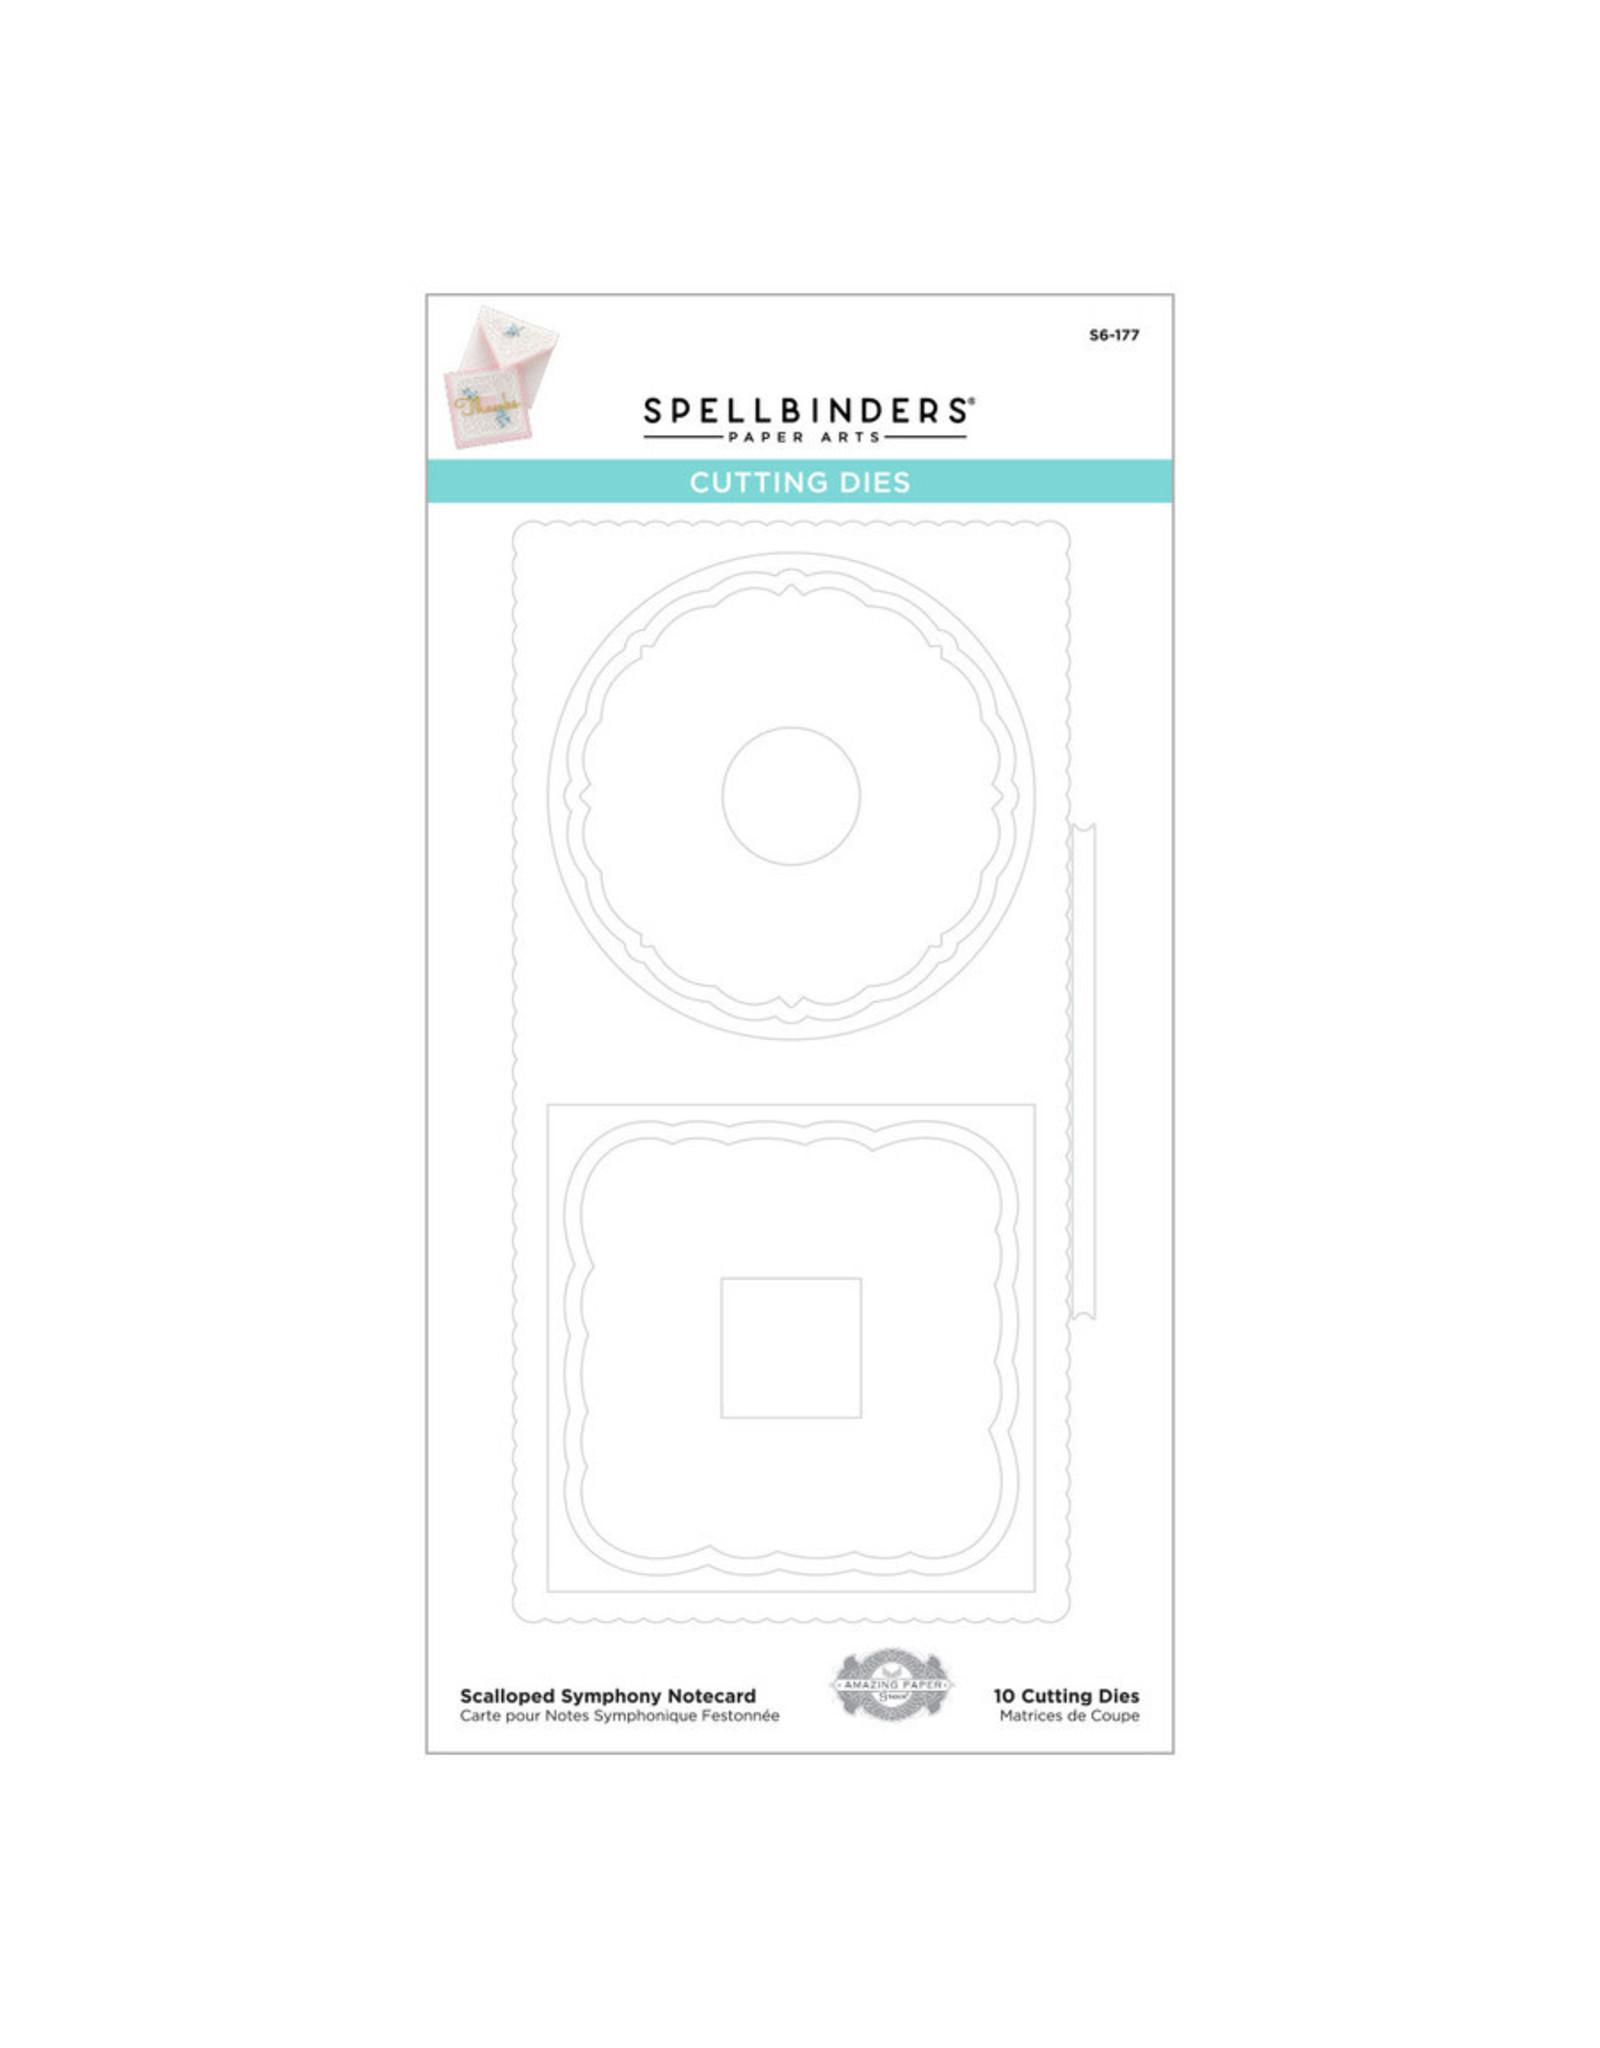 Spellbinders Amazing Paper Grace- Scalloped Symphony Notecard